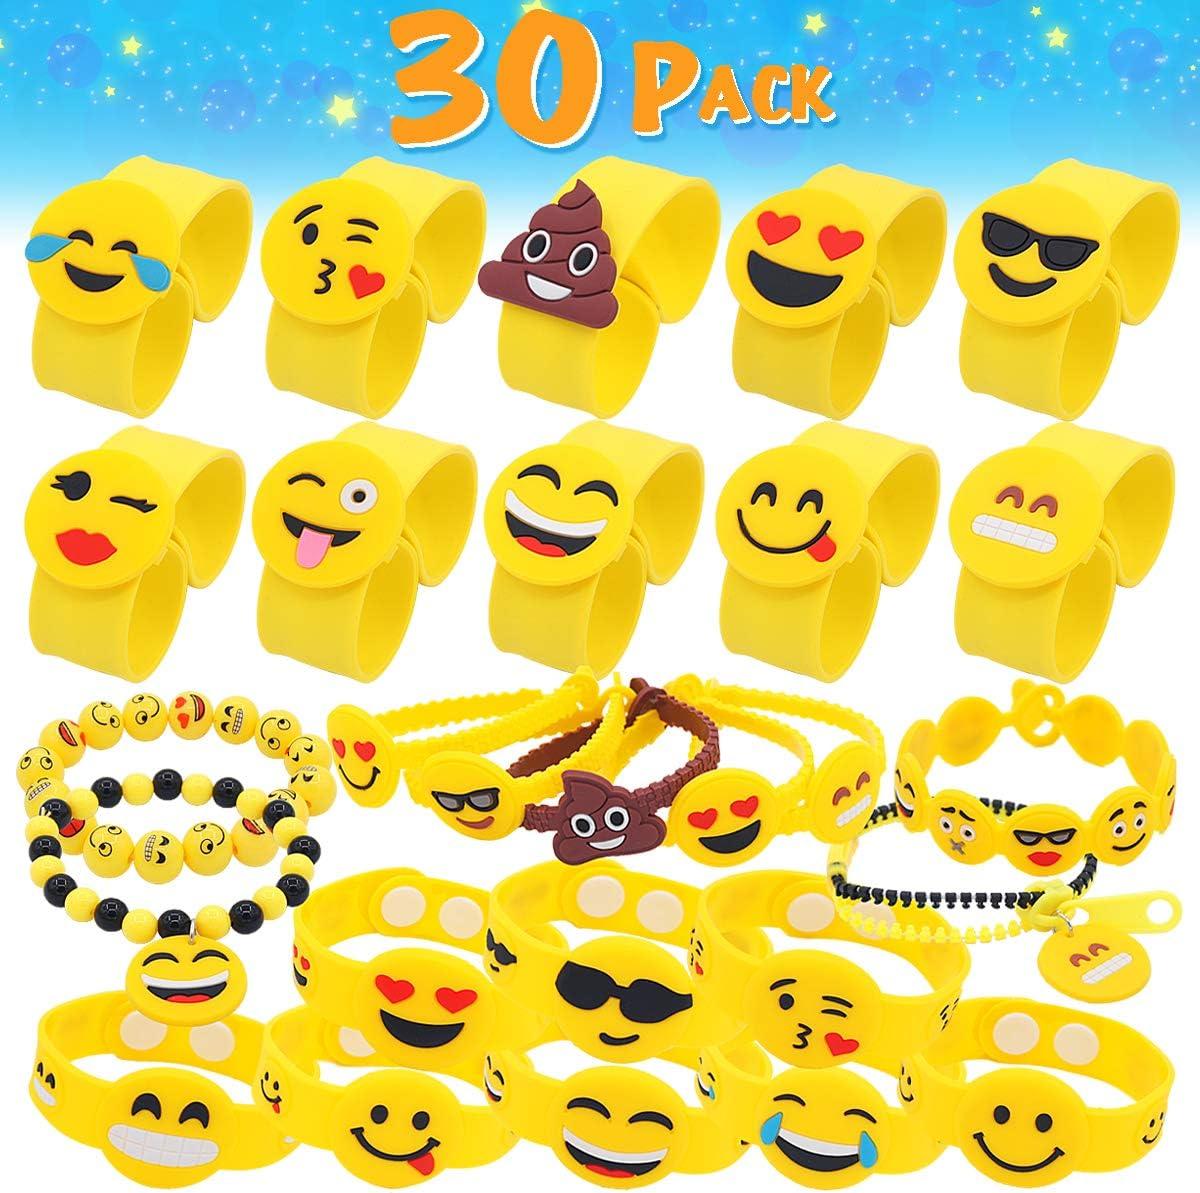 Amazon.com: pawliss Emoji pulseras pulsera, caca suministros ...